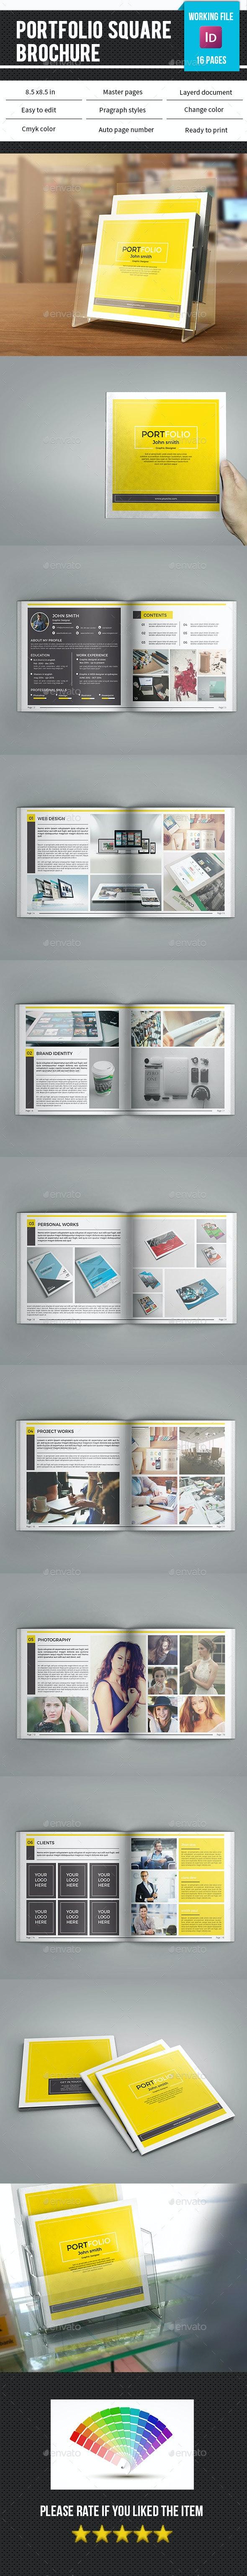 Square Portfolio Brochure-V82 - Portfolio Brochures